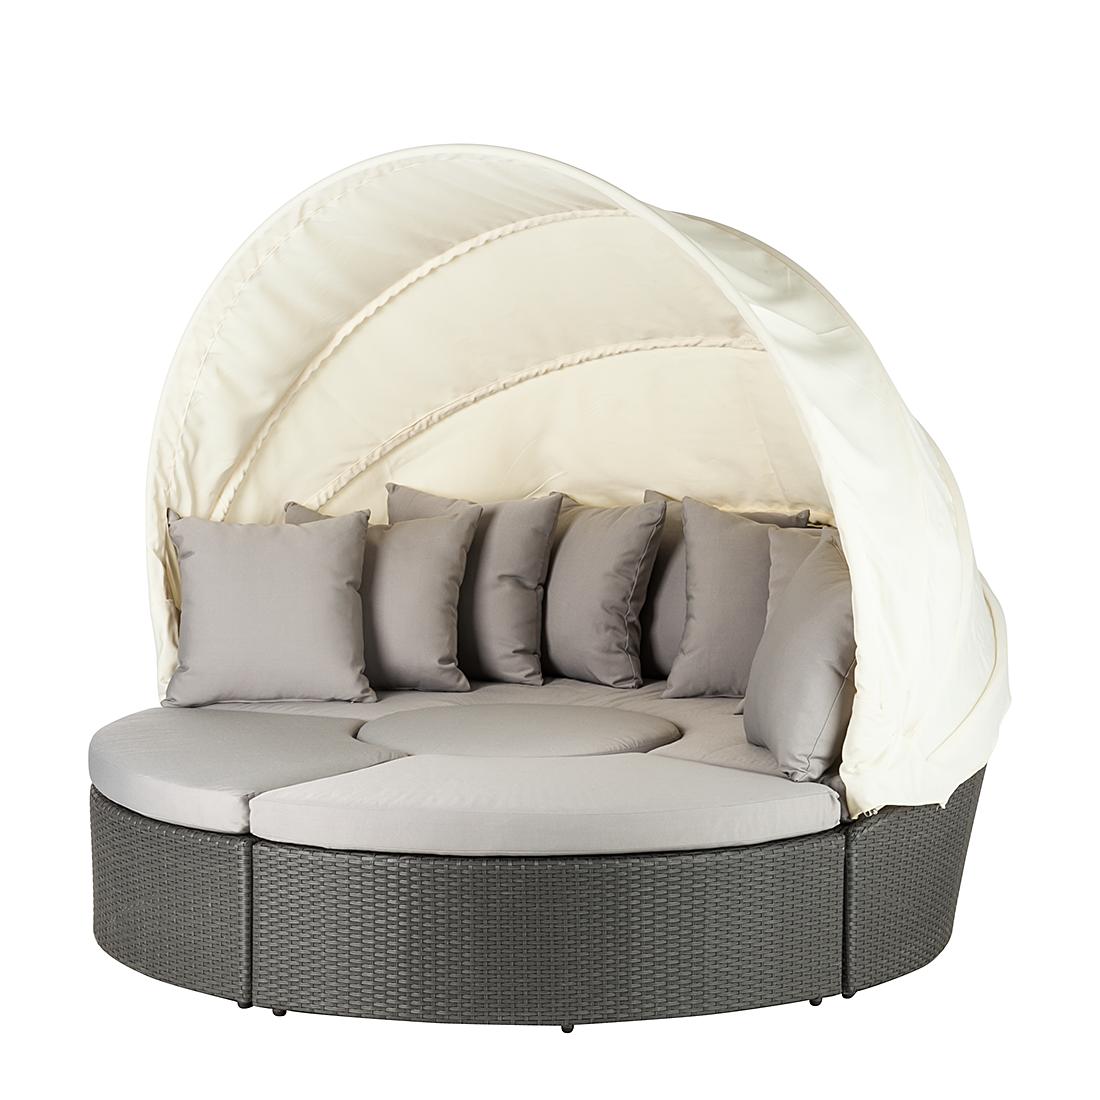 shopping liga m bel profi sonneninsel paradise lounge 4 teilig aus polyrattan stoff in. Black Bedroom Furniture Sets. Home Design Ideas